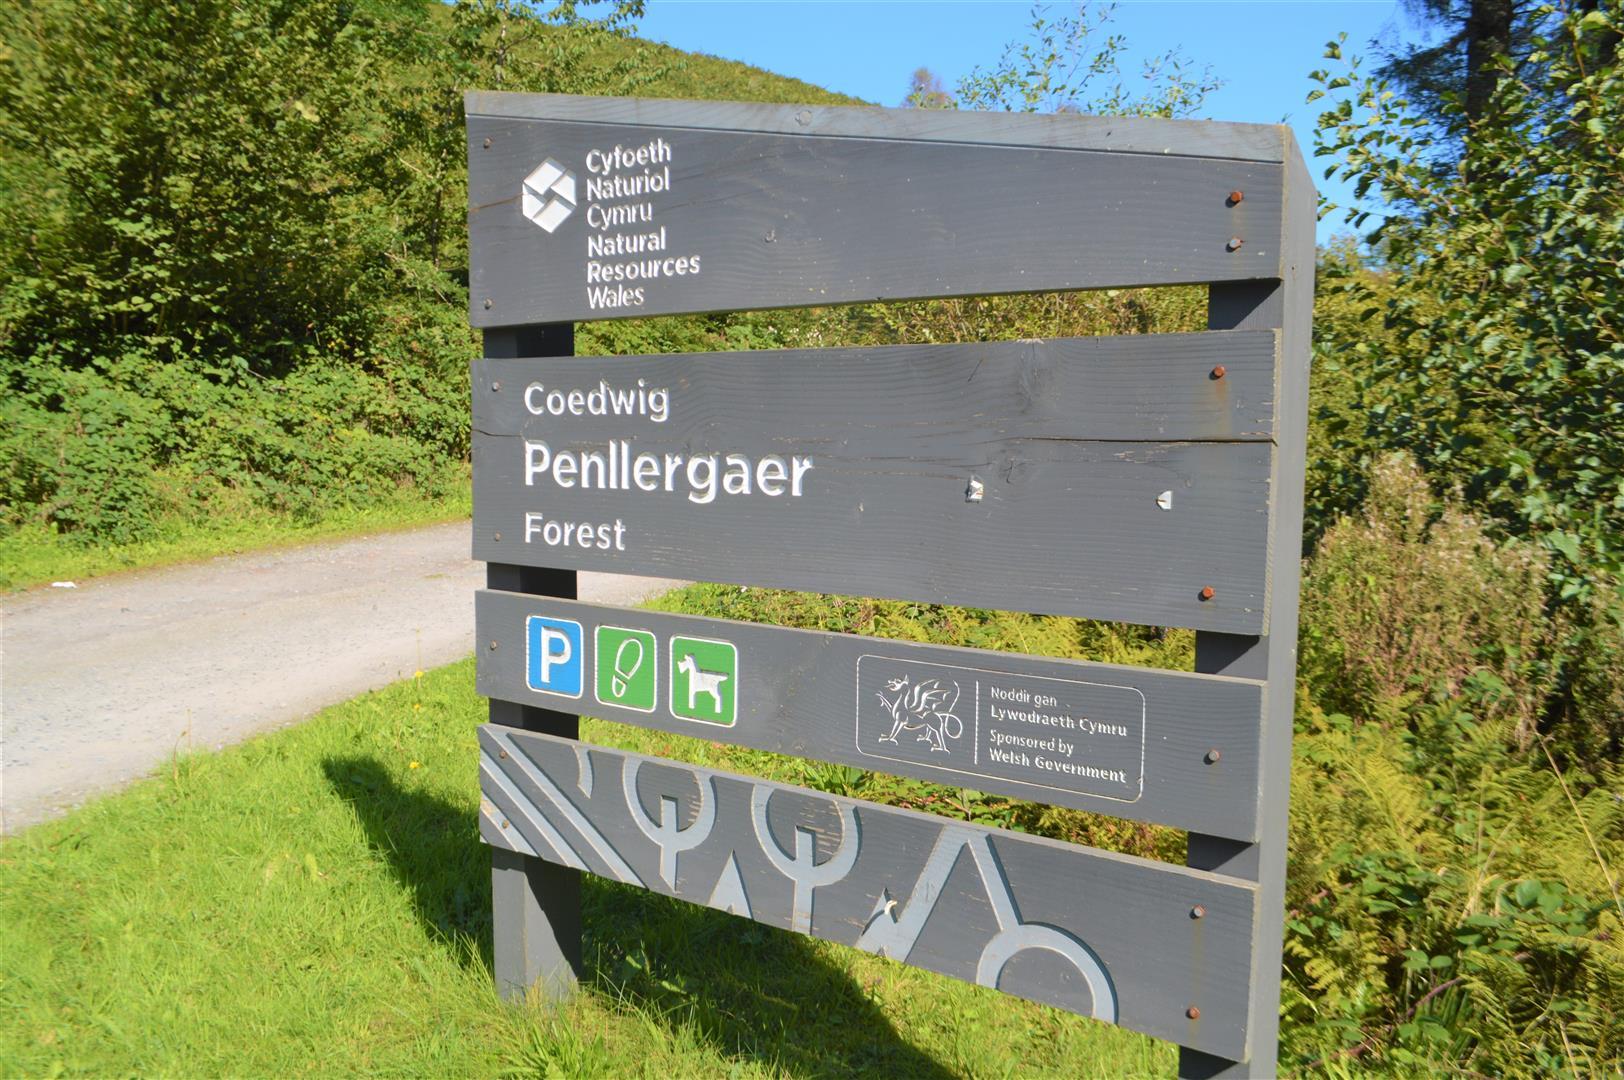 Keepers Close, Penllergaer, SWANSEA, SA4 9FY